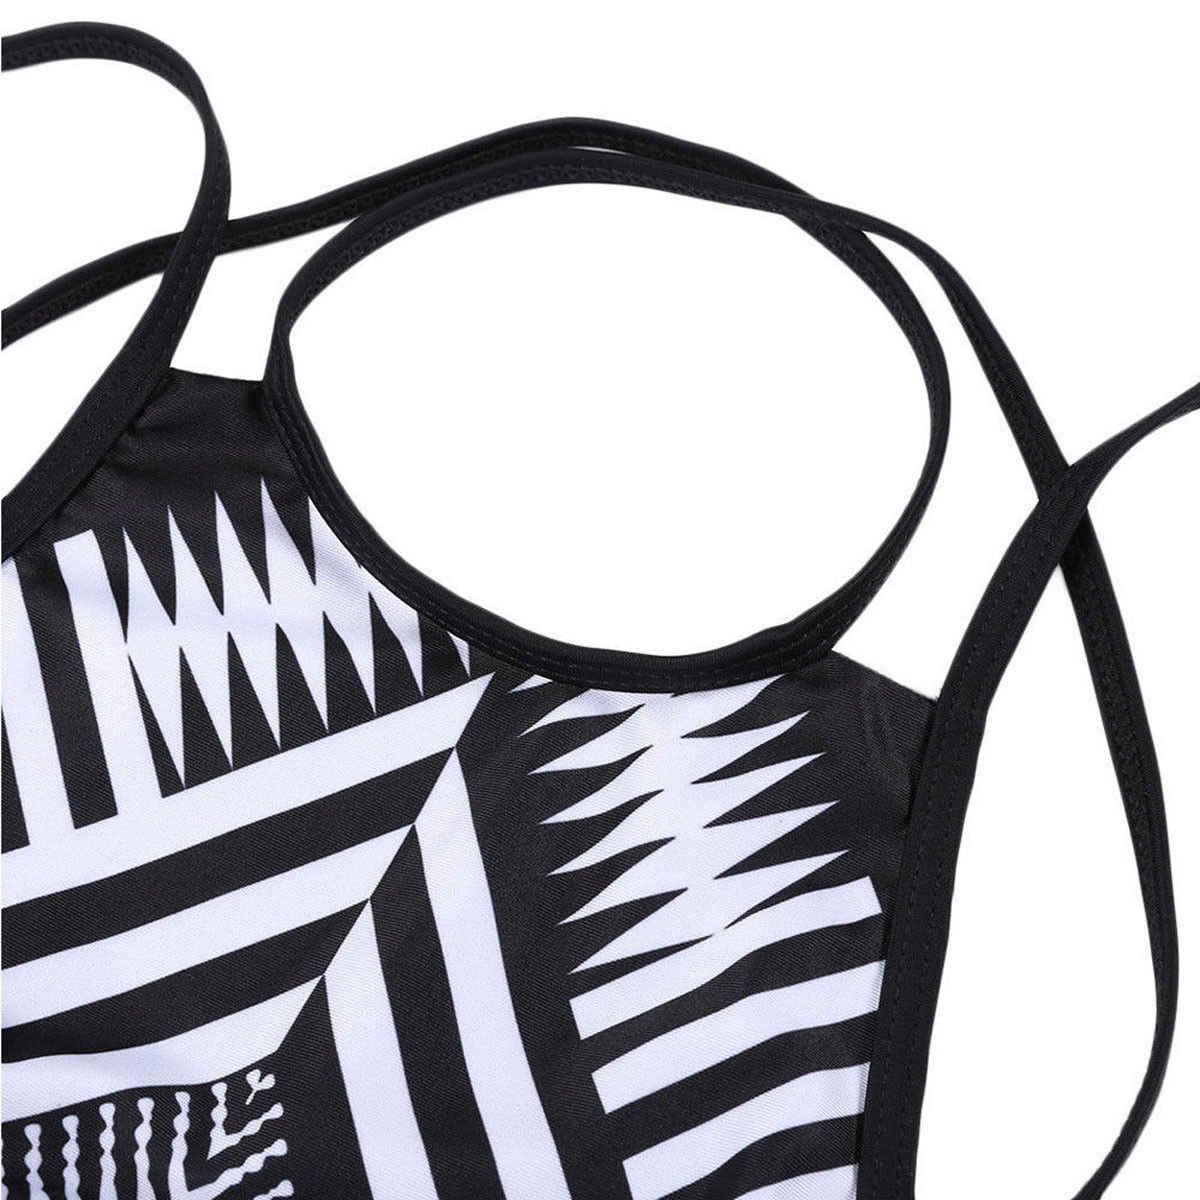 Una pieza acolchada Bikini mujeres traje de baño vendaje Push-up traje de baño